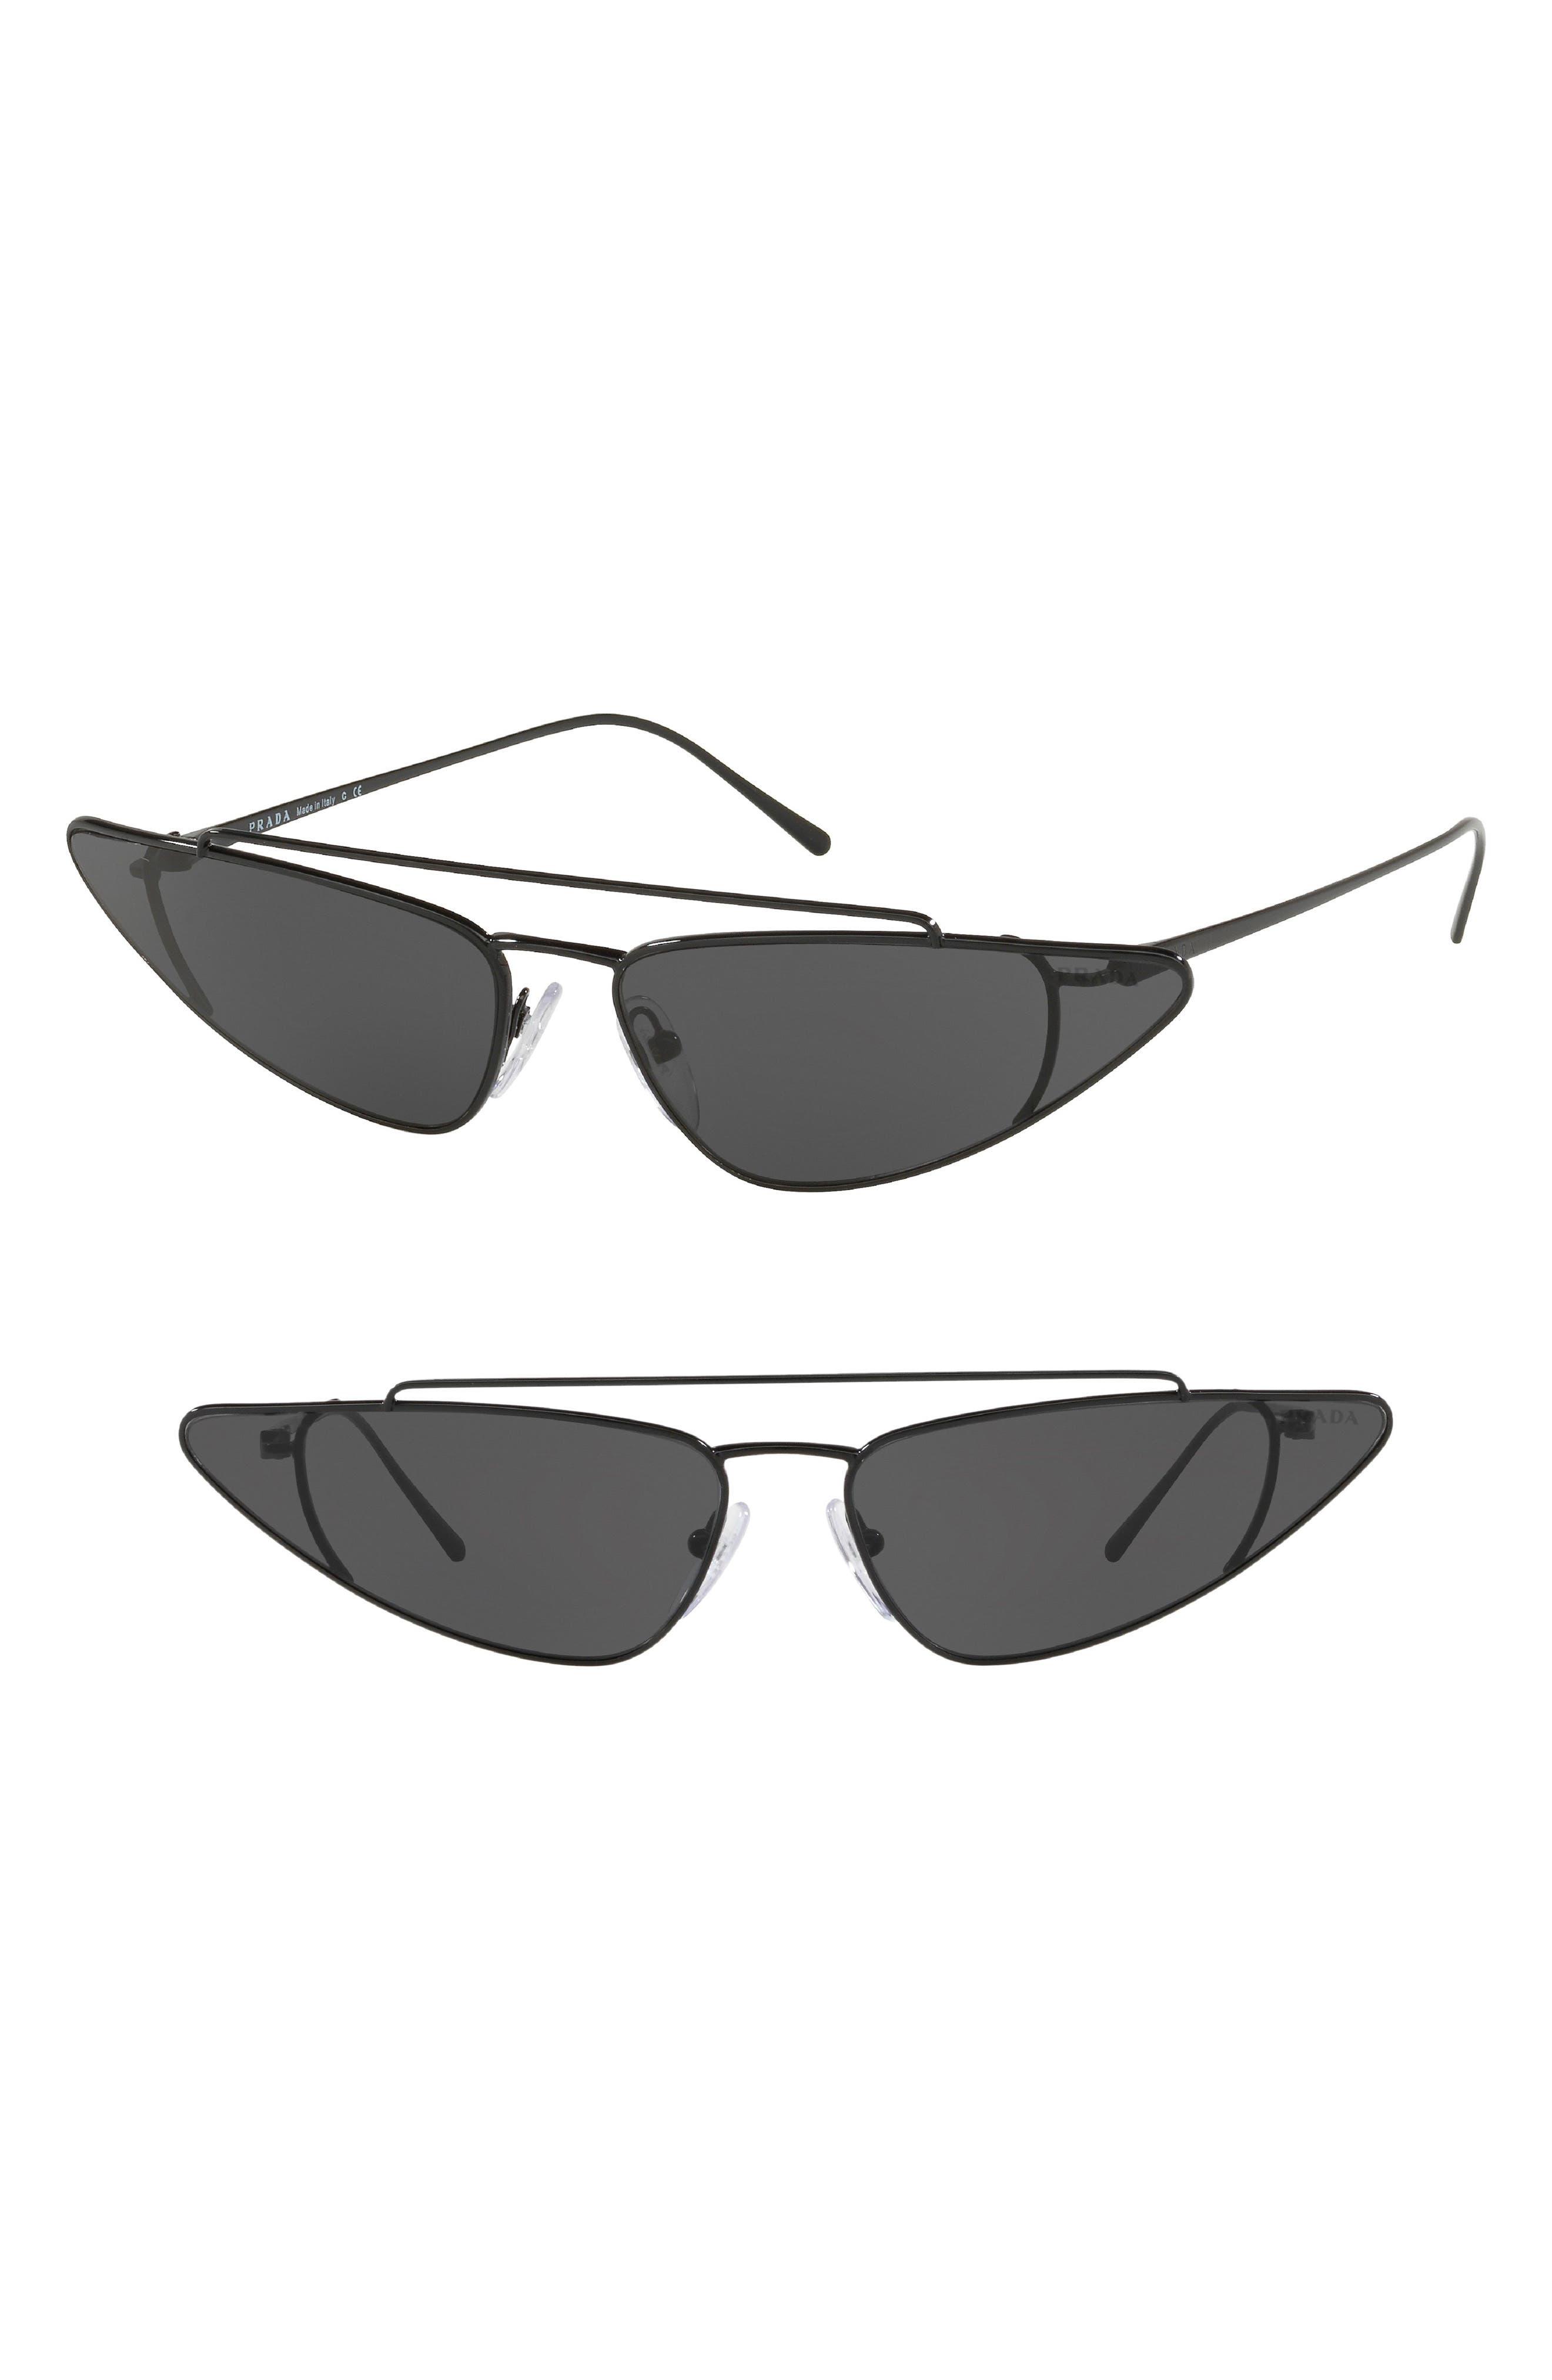 Ultravox 68mm Oversize Cat Eye Sunglasses,                             Main thumbnail 1, color,                             BLACK SOLID